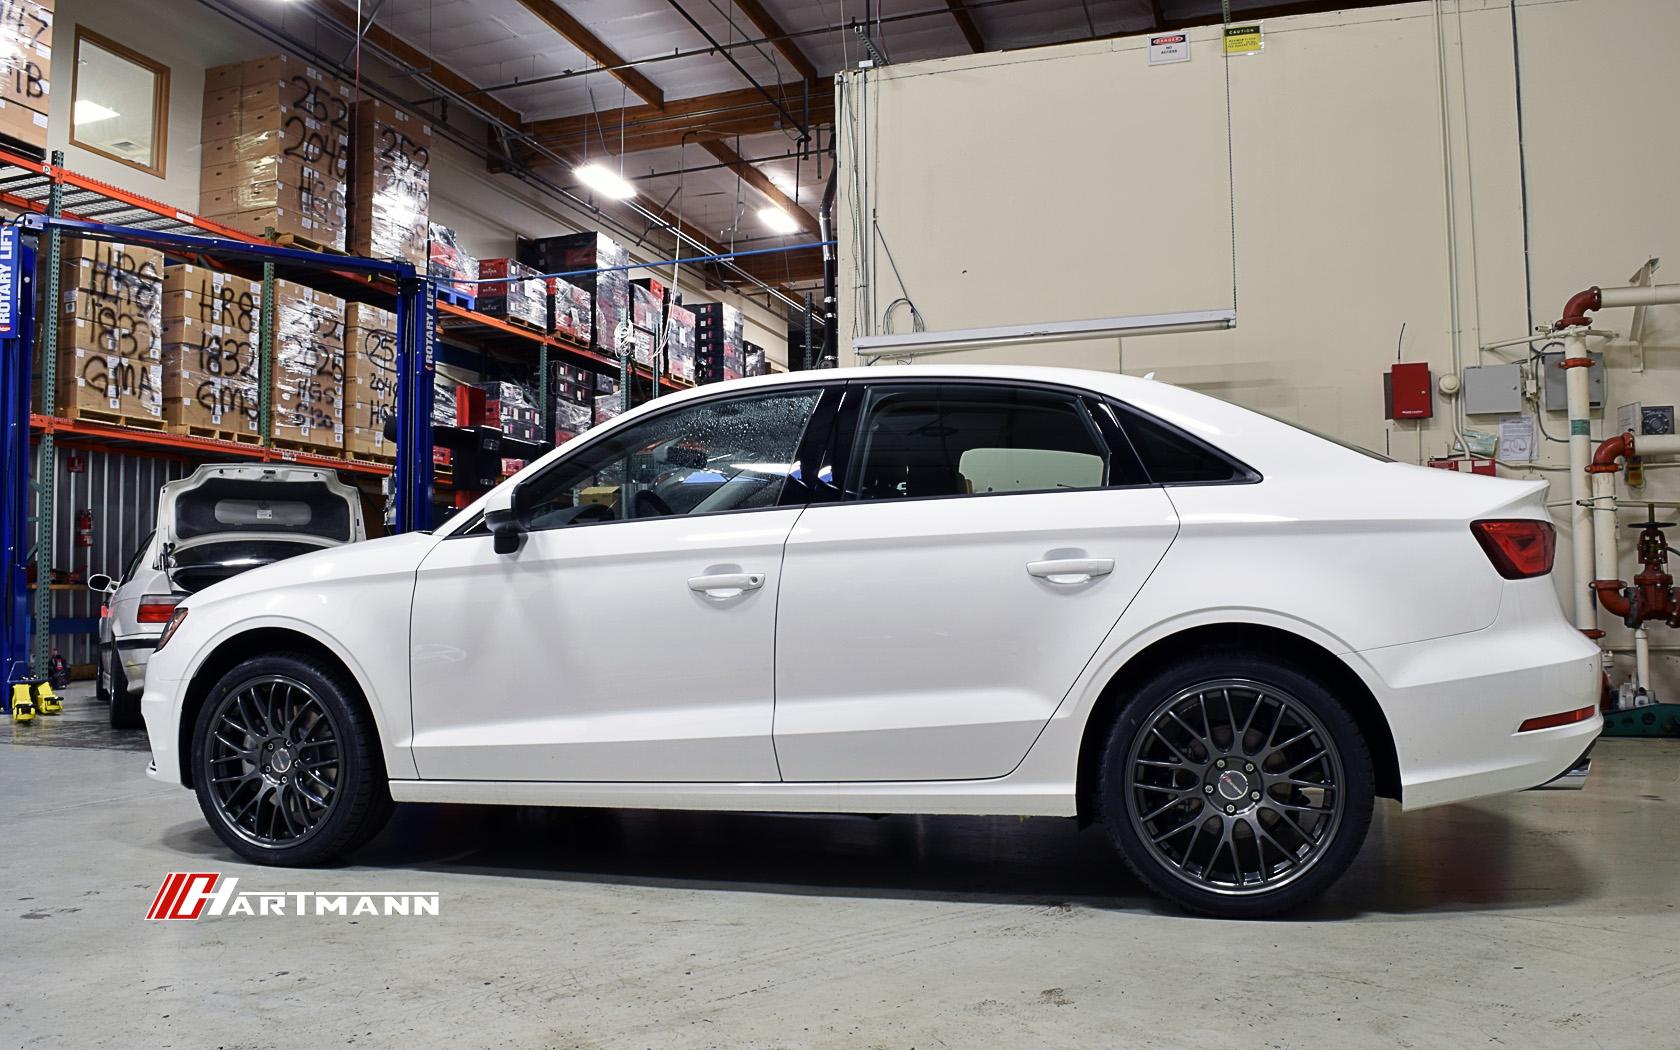 Vw Dealers Ma >> Hartmann Euromesh 4-GA Wheels for Audi fitment - Hartmann ...